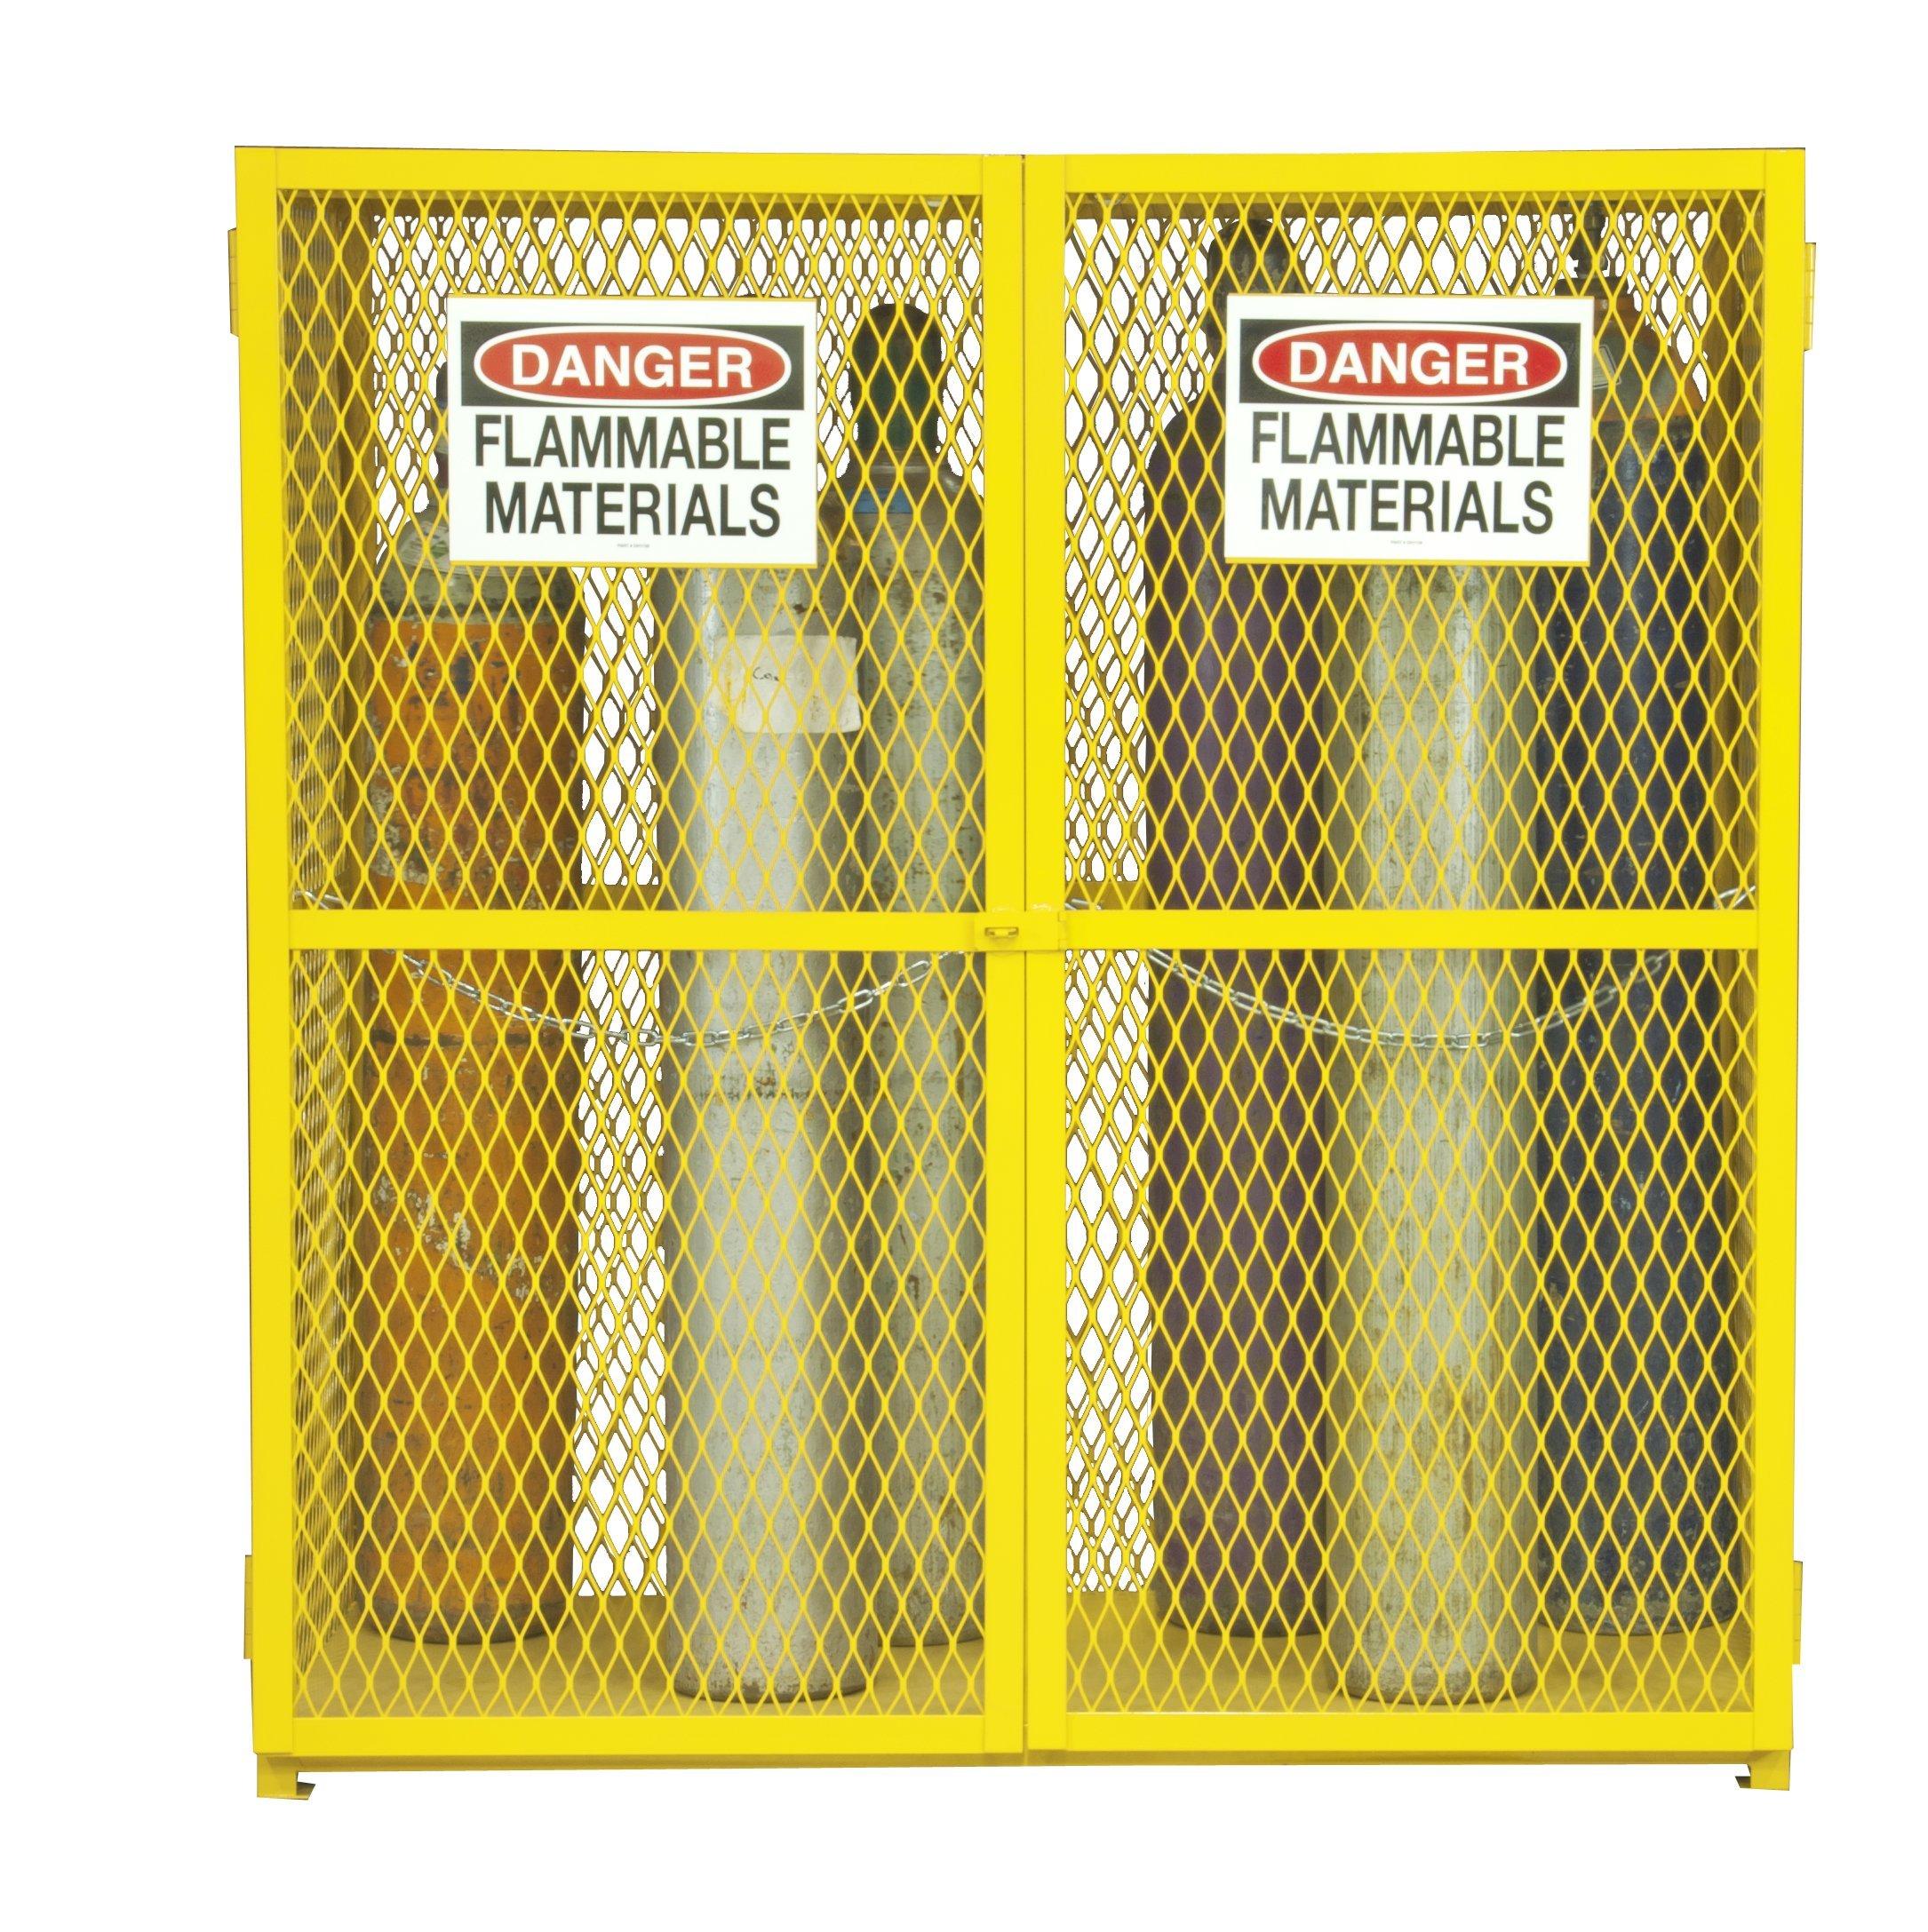 Durham Steel/Iron Vertical Cylinder Storage Cabinet, EGCVC18-50, 18 Cylinder Capacity, 30'' Length x 60'' Width x 71-3/4'' Height, Yellow Powder Coat Finish